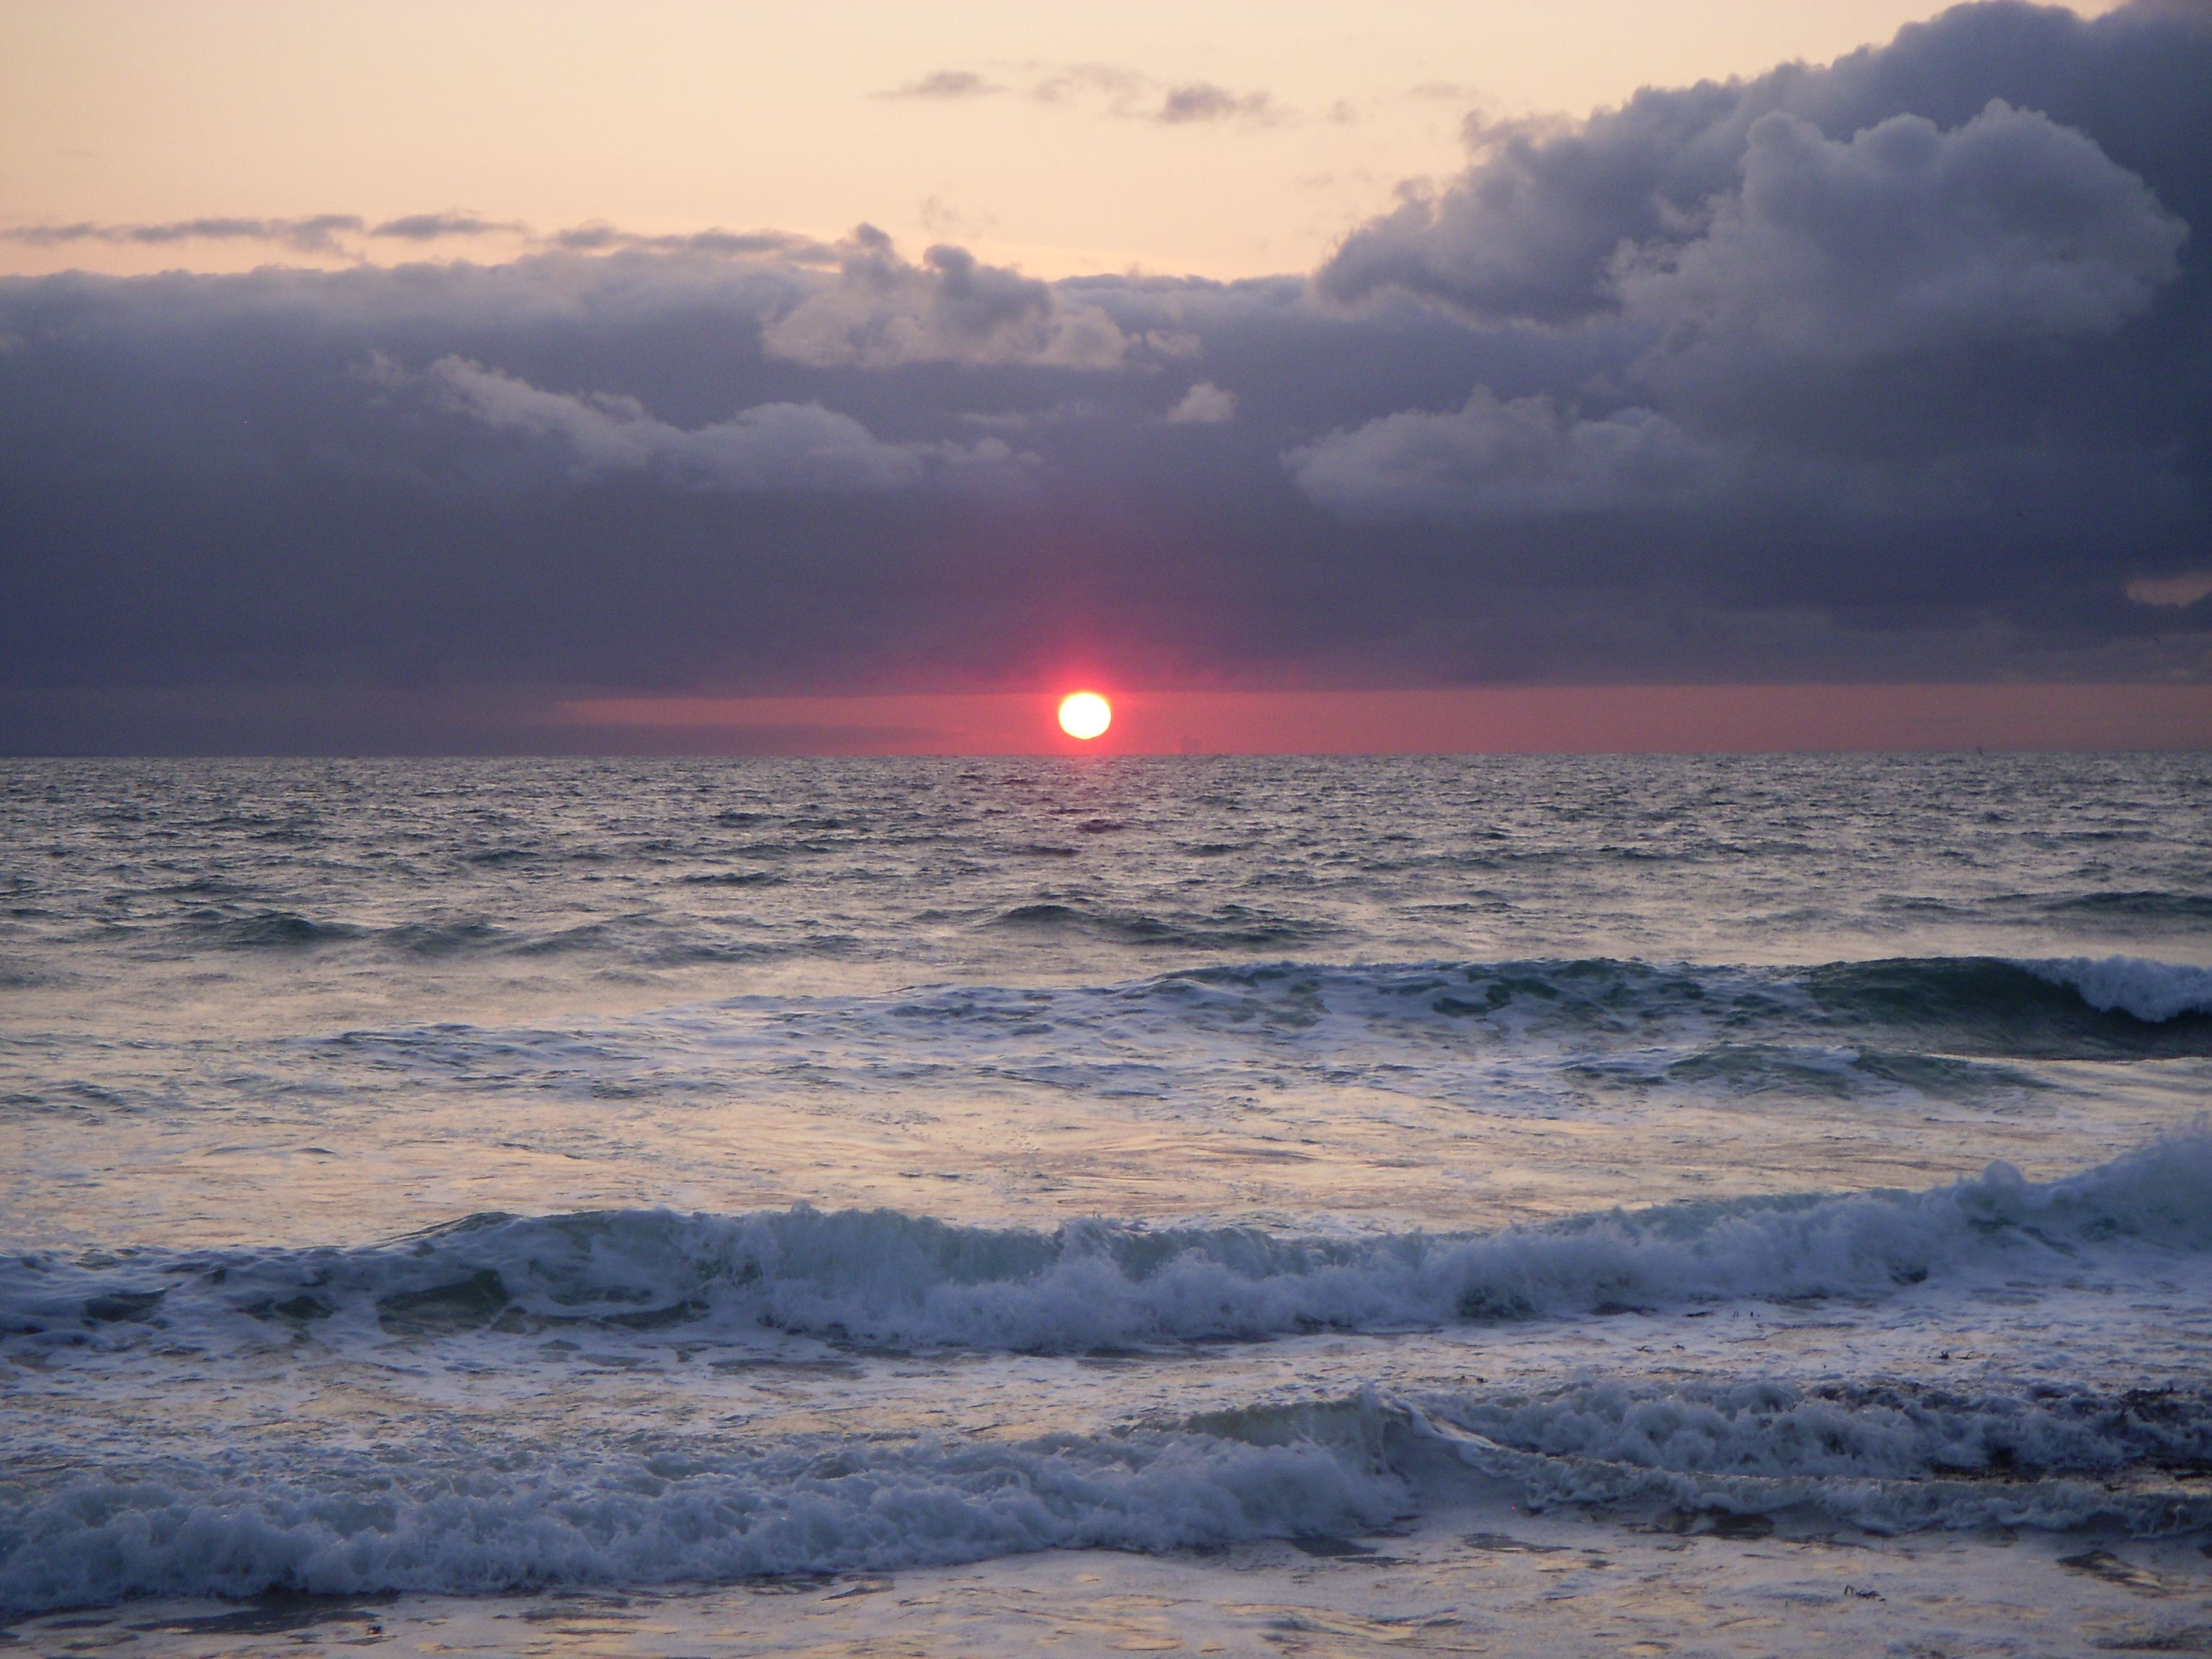 Surtainville, Sonnenuntergang - Foto: S. Hopp